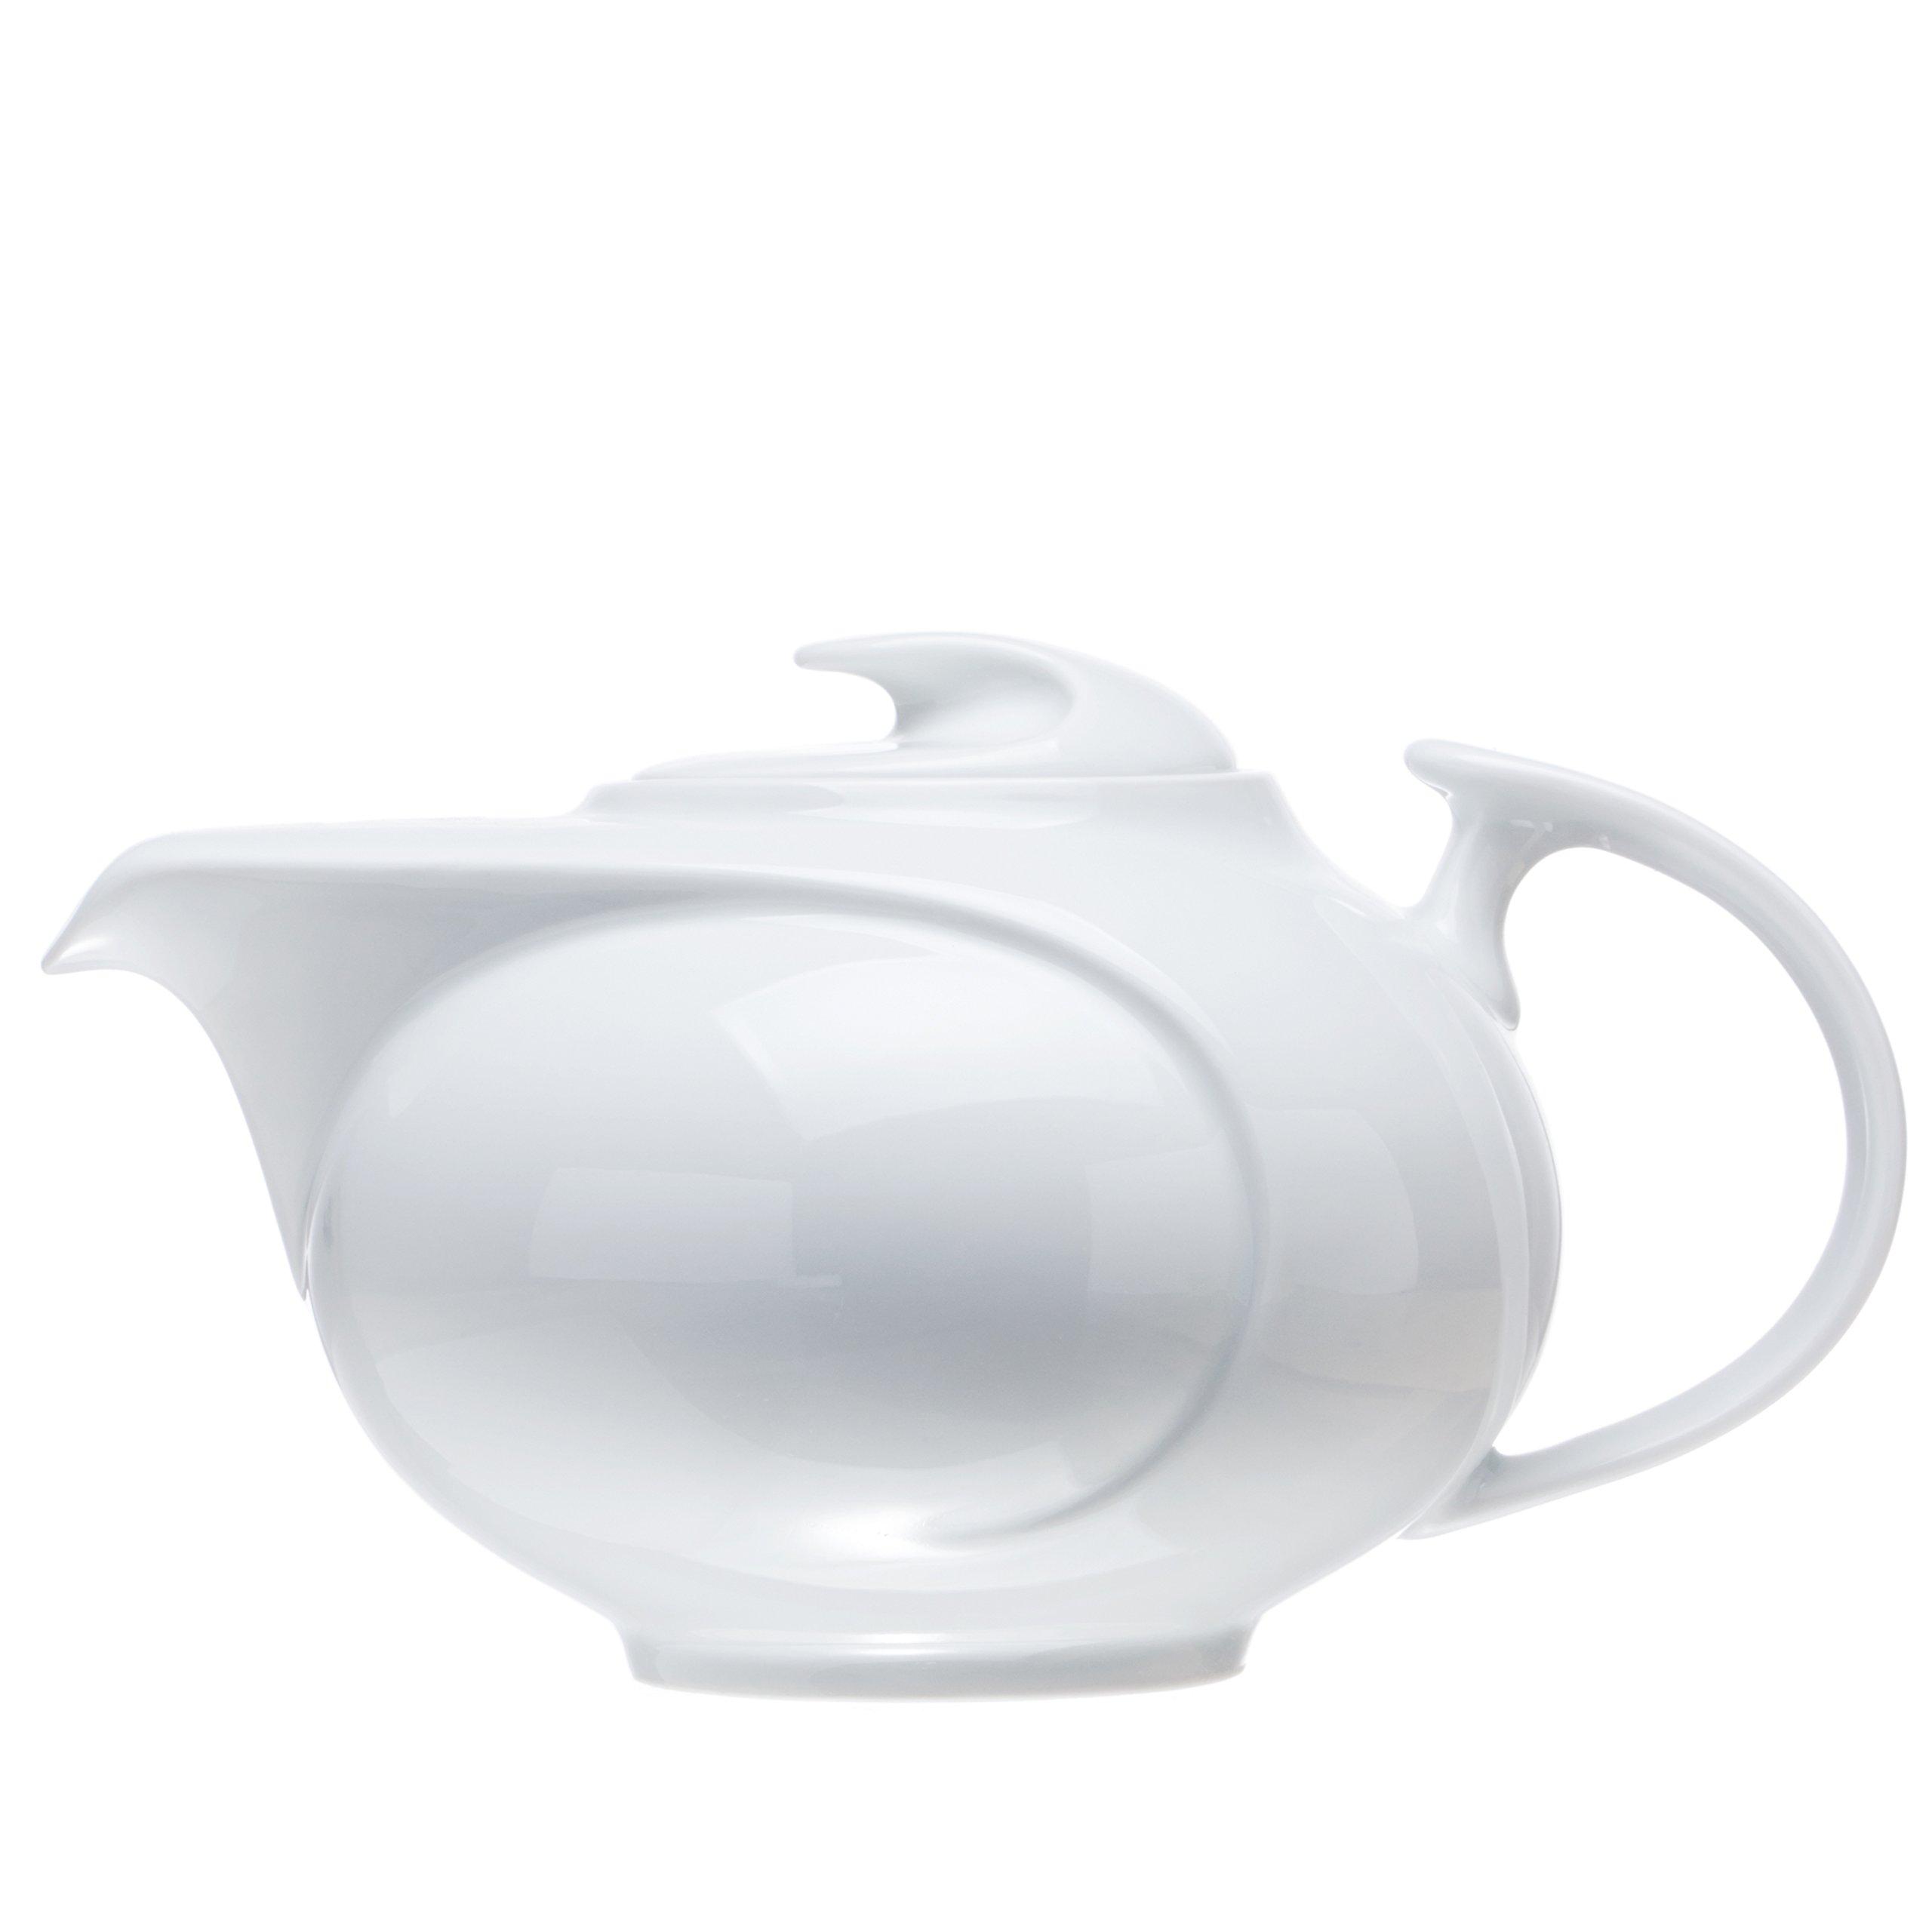 White Porcelain TEAPOT (2 Size), Restaurant&Hotel Quality (40 oz)